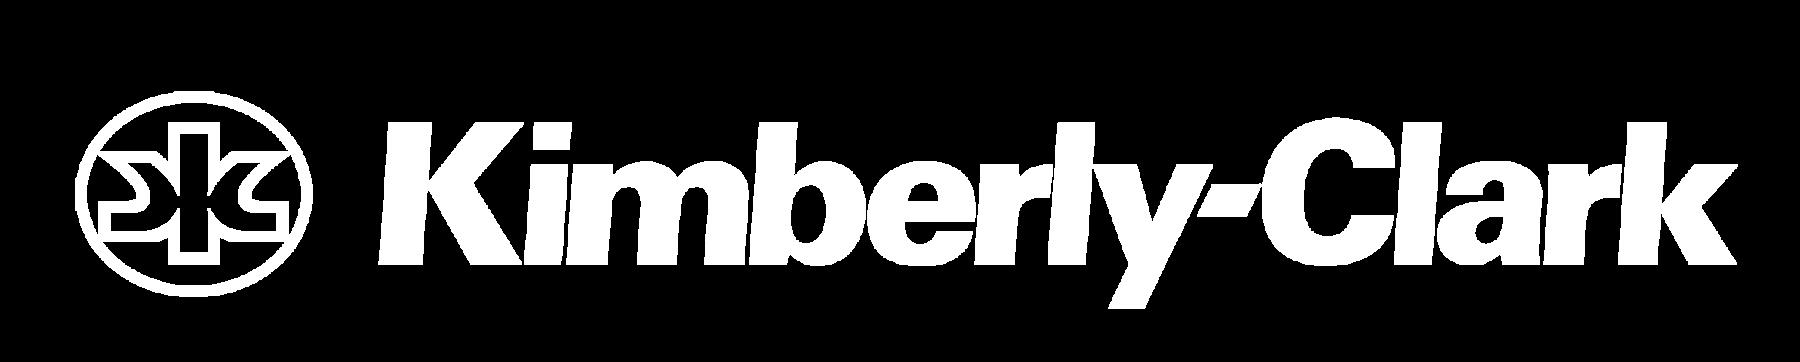 kimberlycark